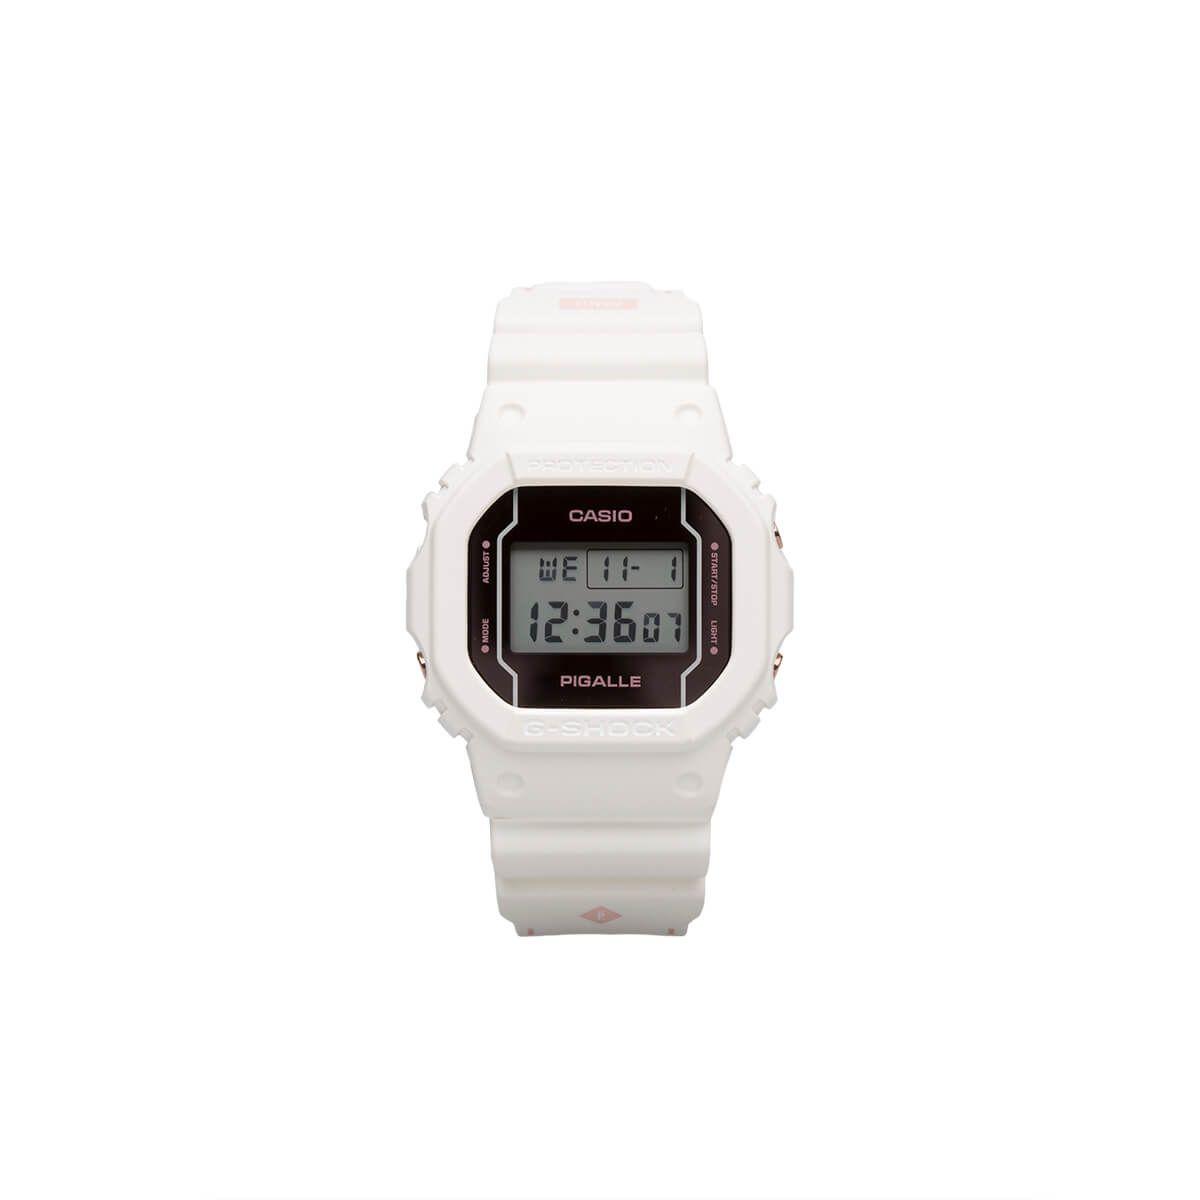 g-shock -  Digital Wrist Watch